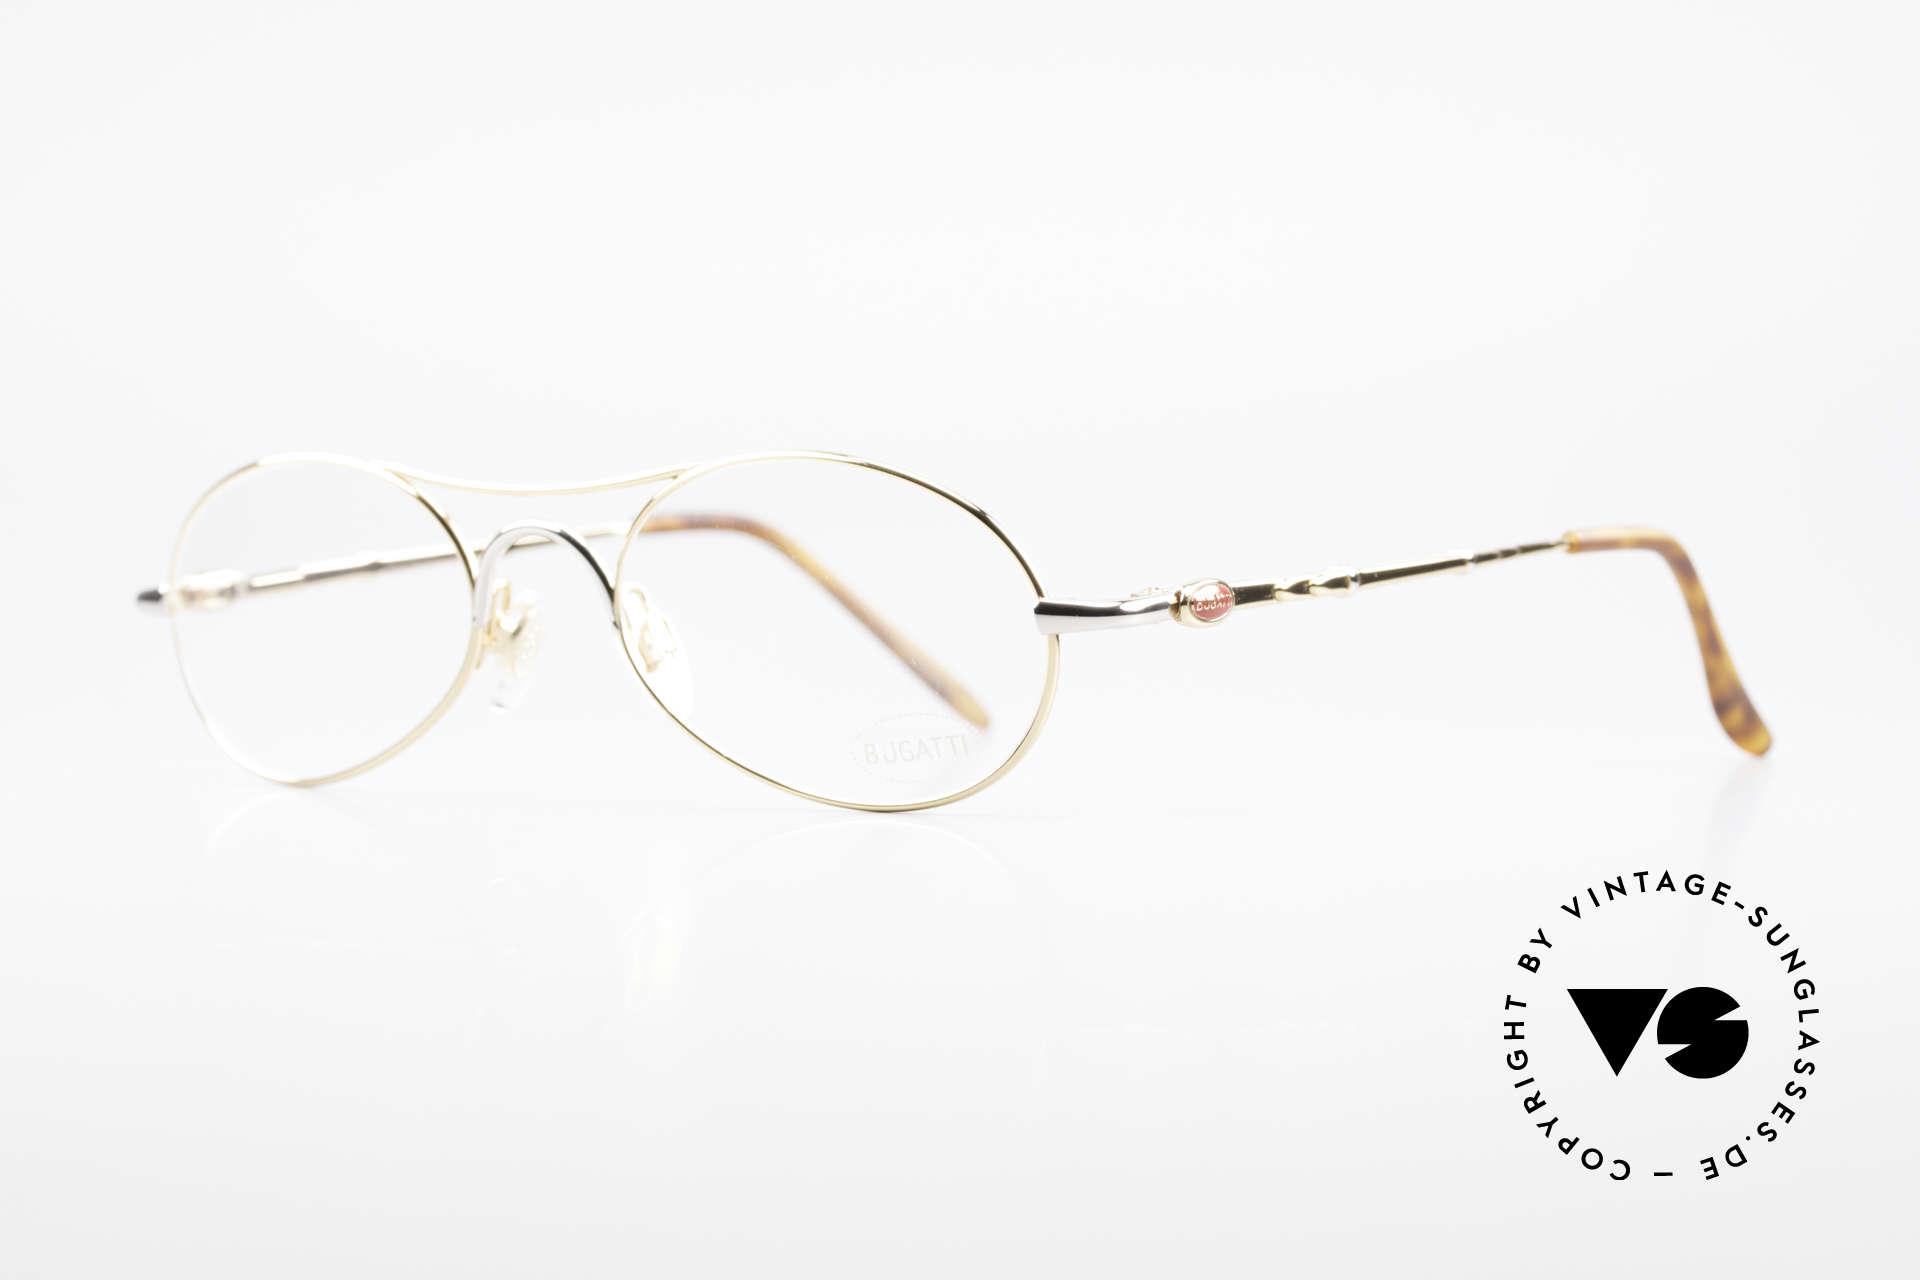 Bugatti 10608 90's Luxury Men's Eyeglasses, flexible spring hinges, made around 1995 in France, Made for Men